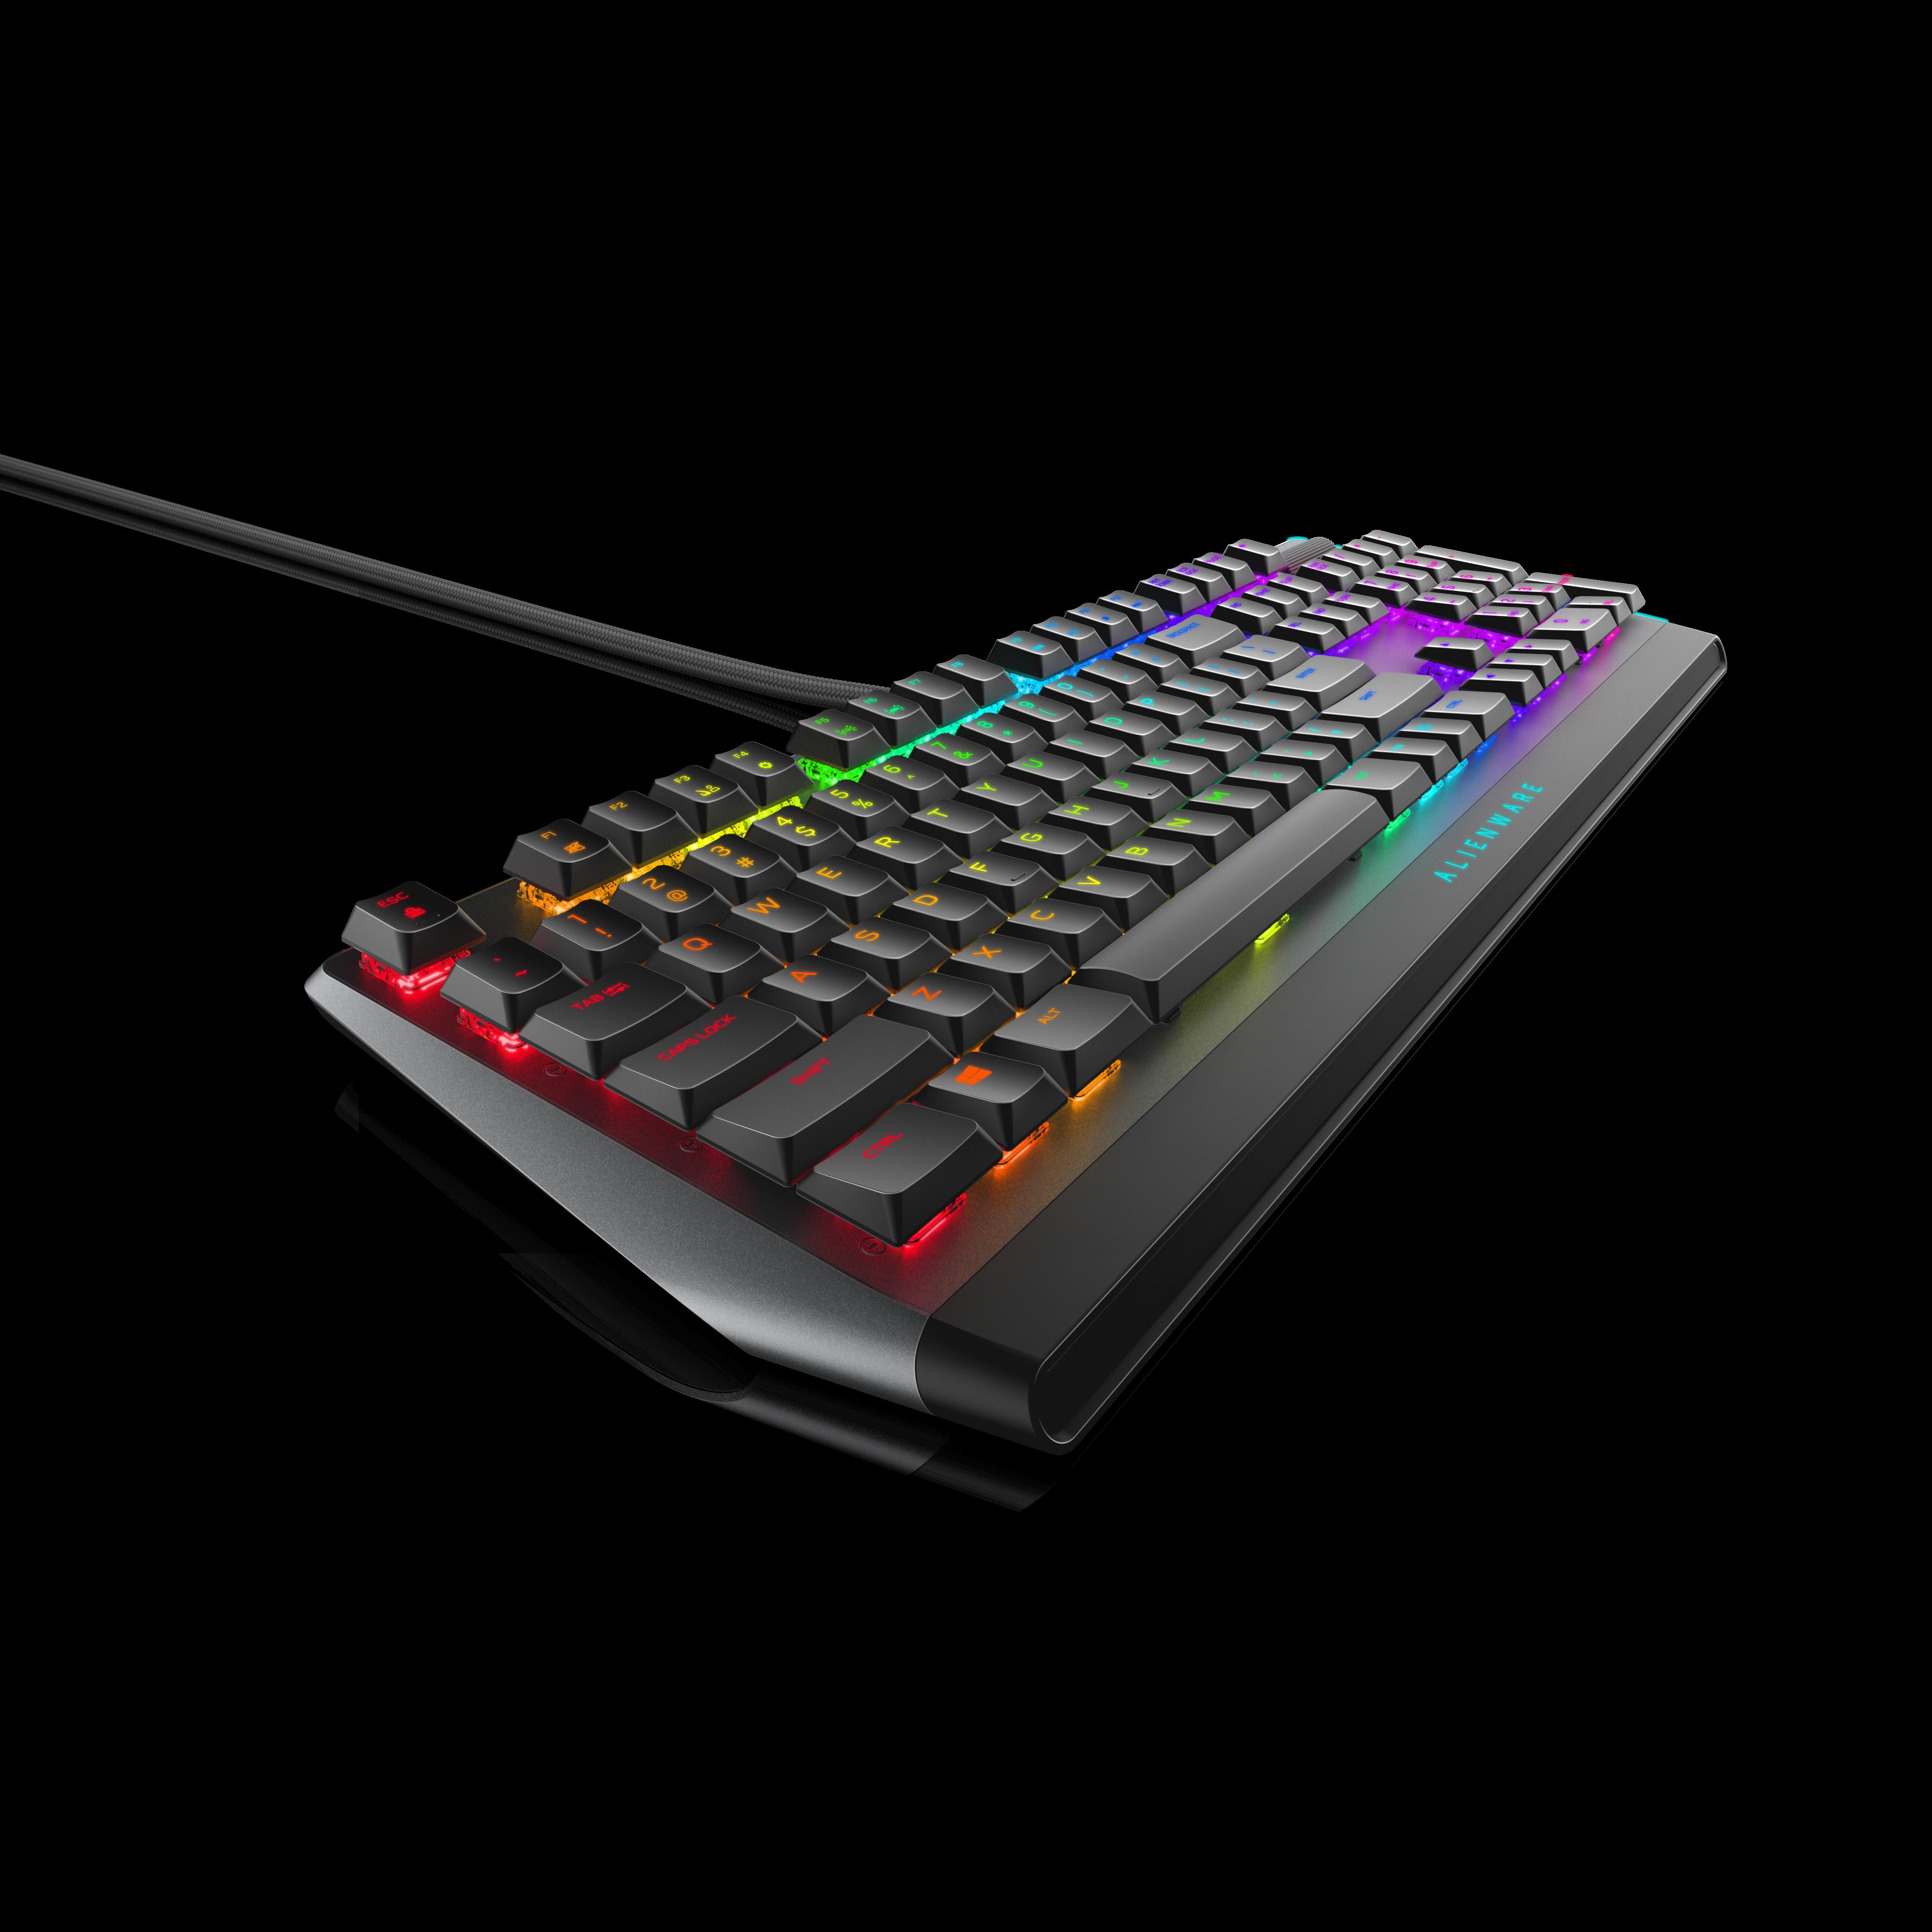 Alienware Aurora-keyboard